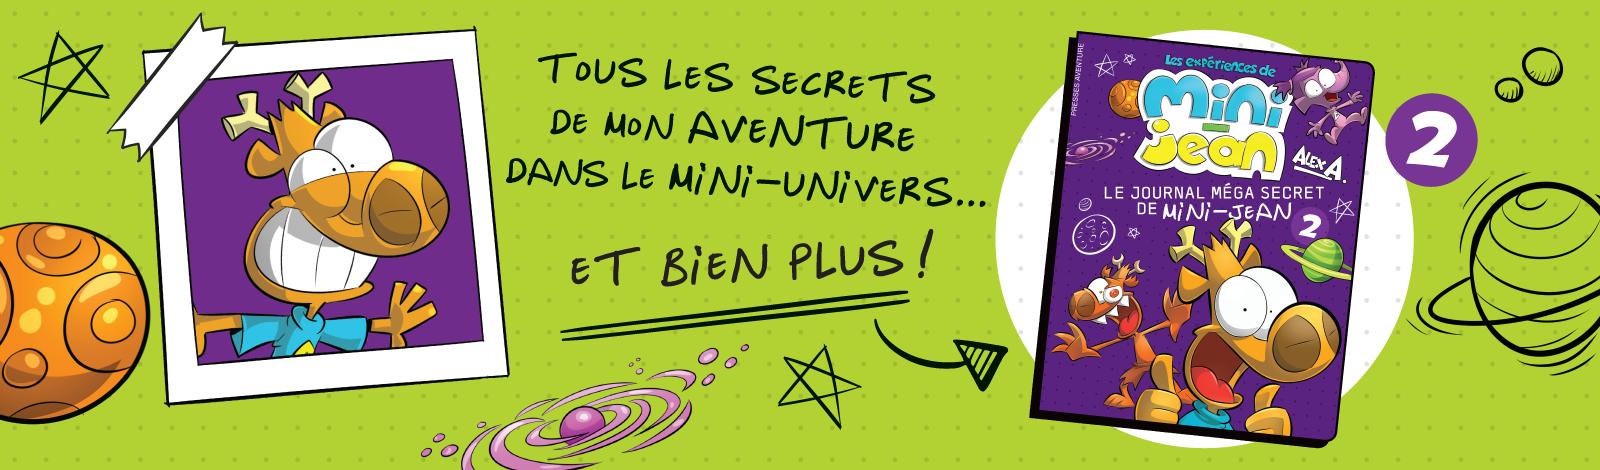 Mini-Jean journal méga secret